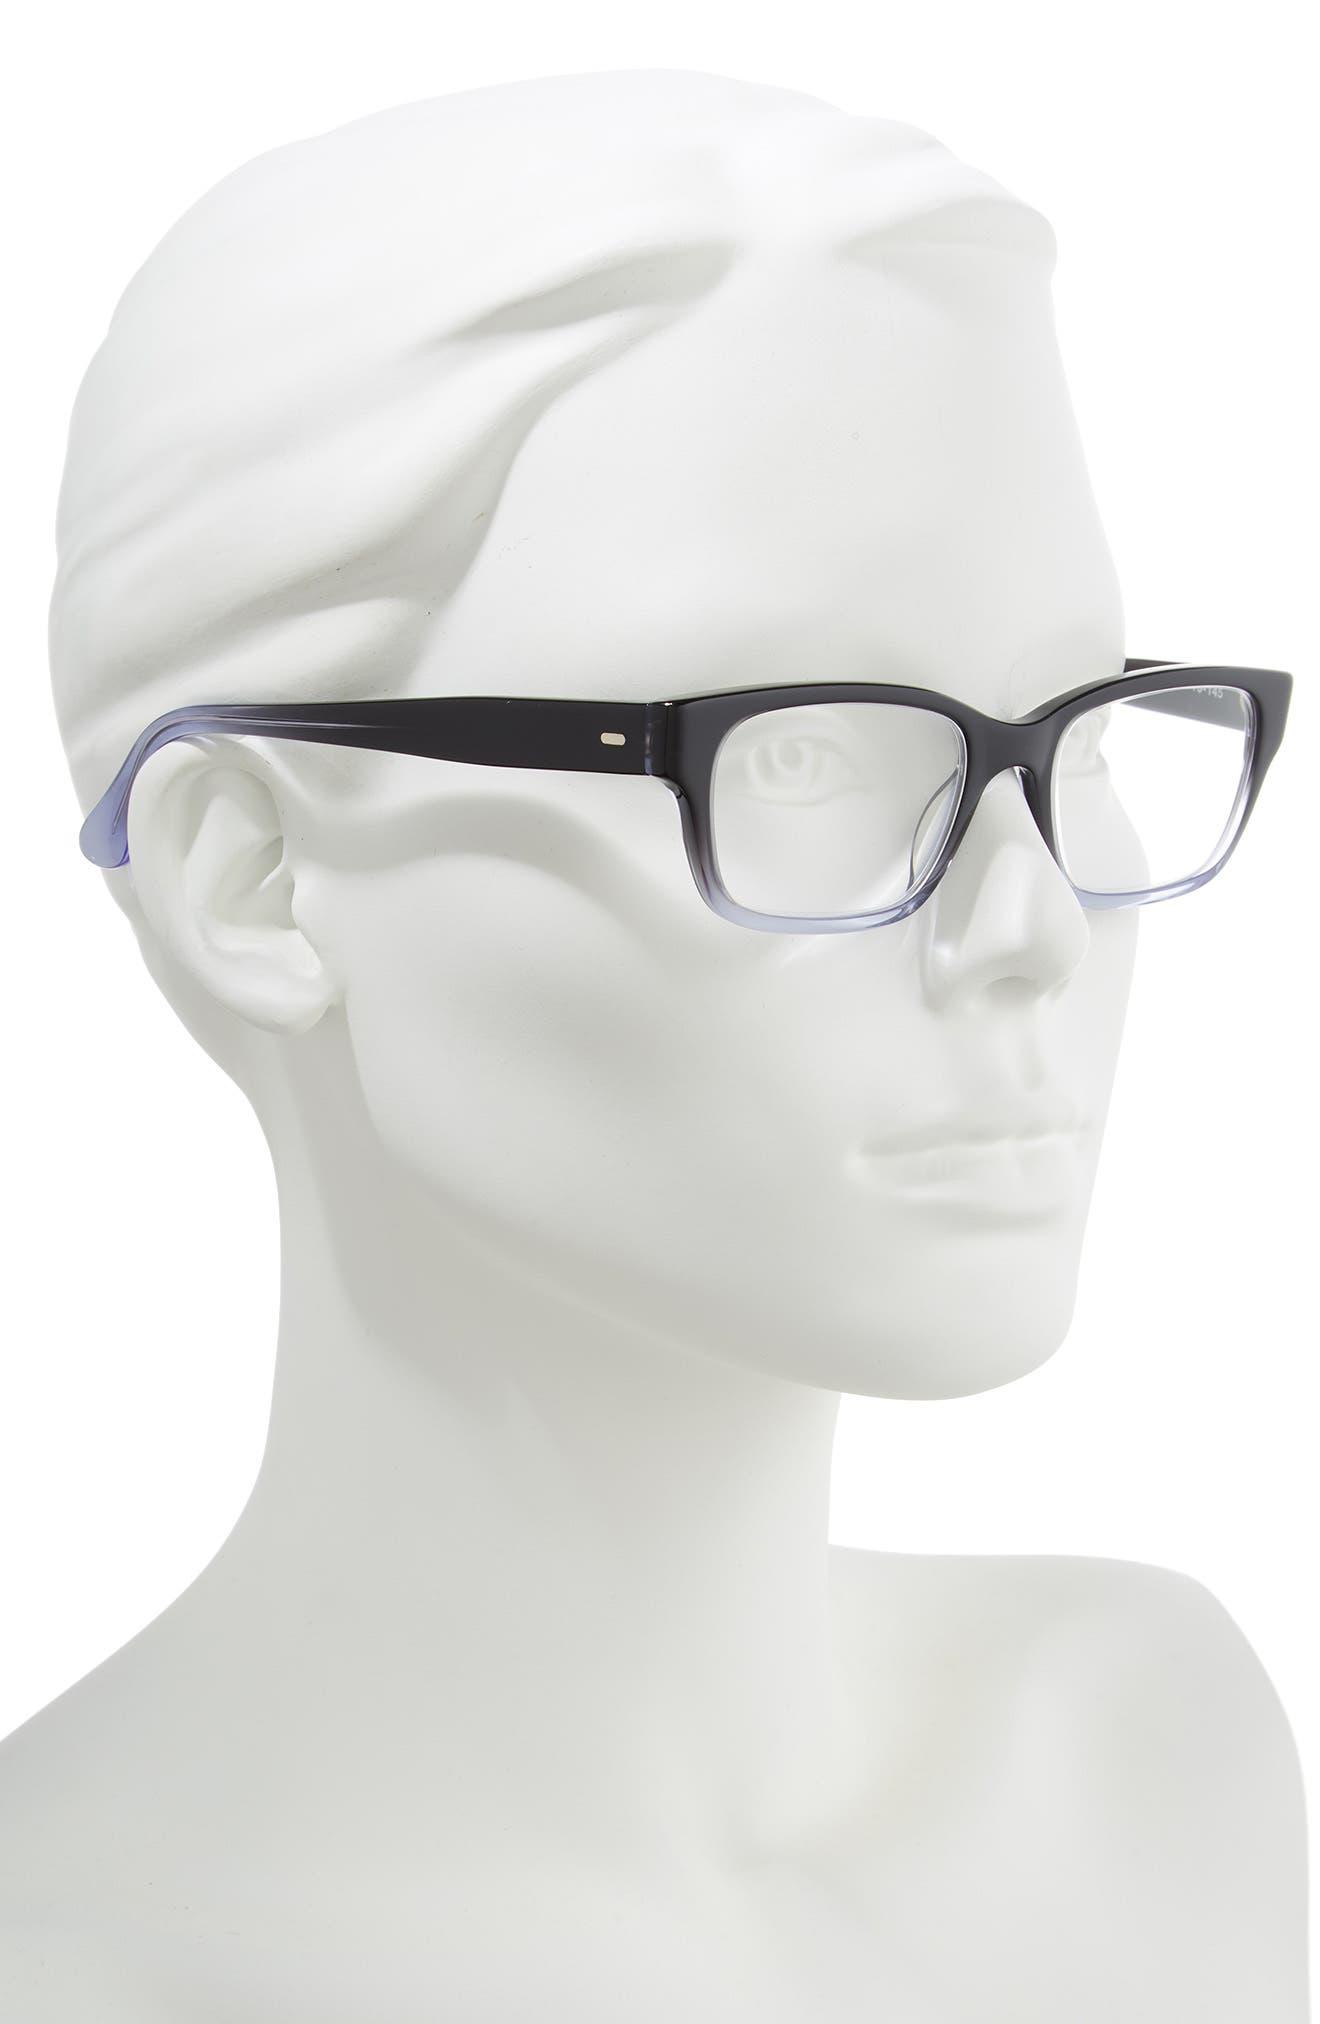 CORINNE MCCORMACK, 'Sydney' 51mm Reading Glasses, Alternate thumbnail 2, color, 006